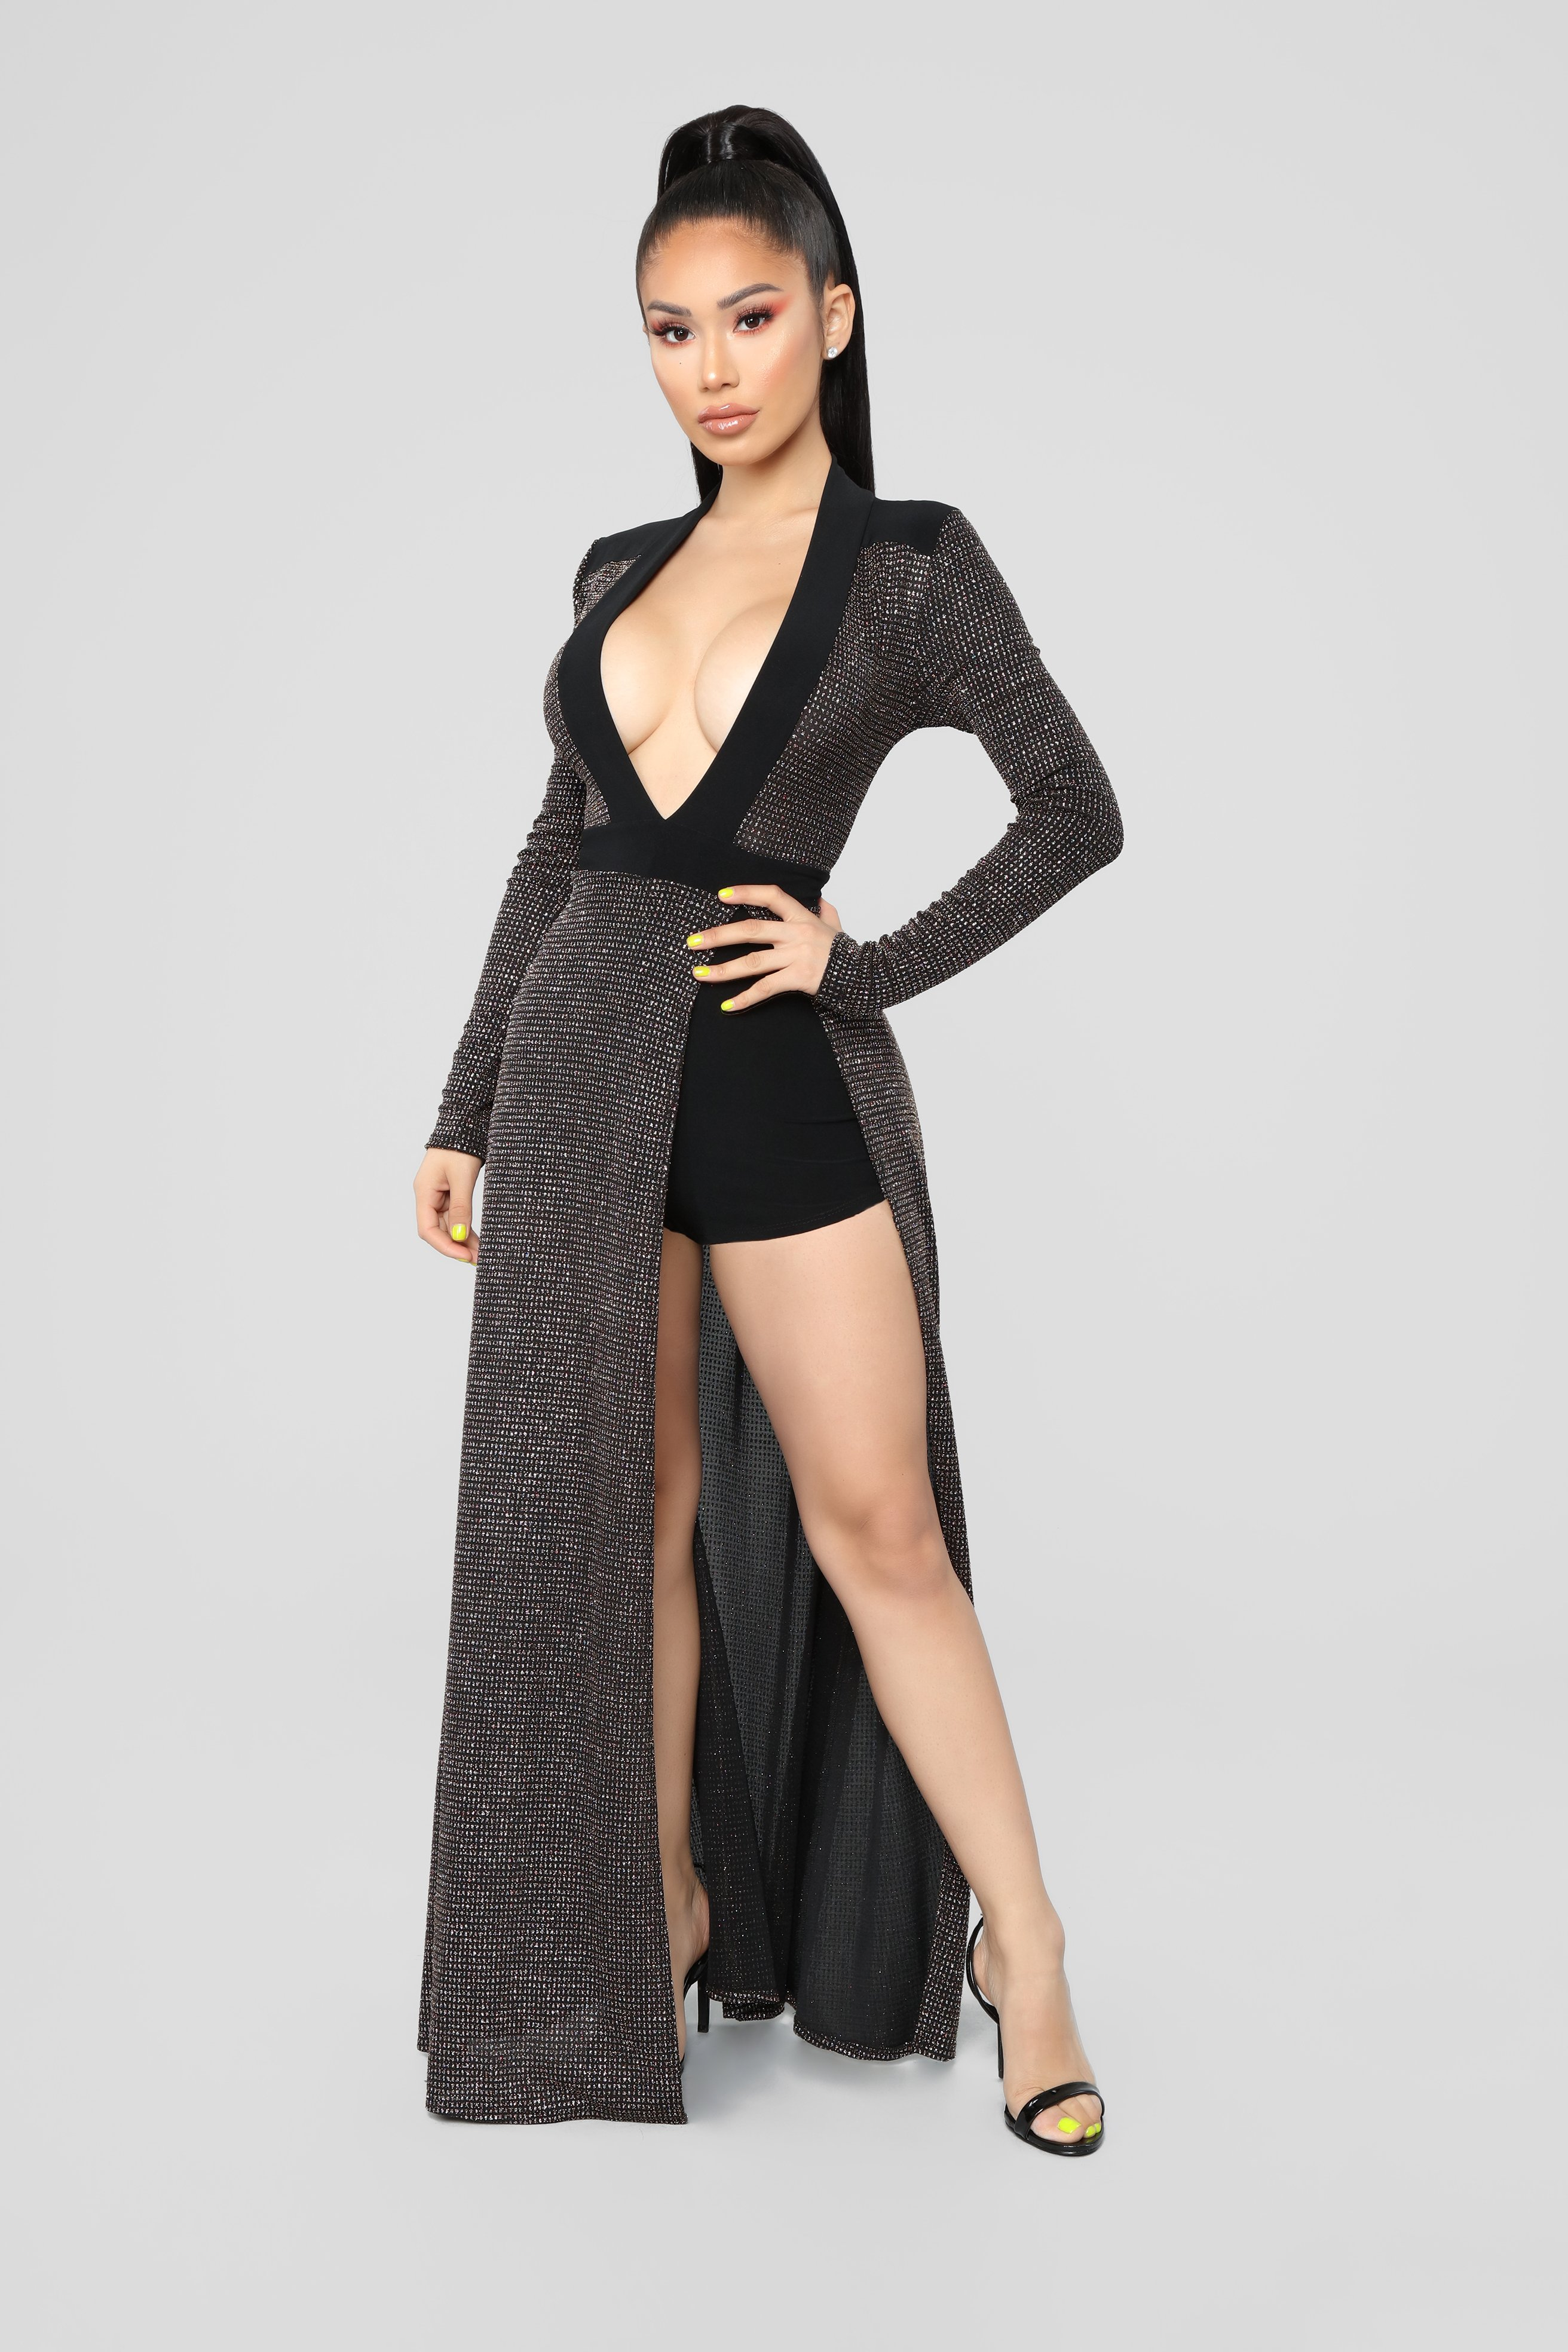 26bf5c8eb34 Fashion Nova Maternity Dress Dress Code Fashion t